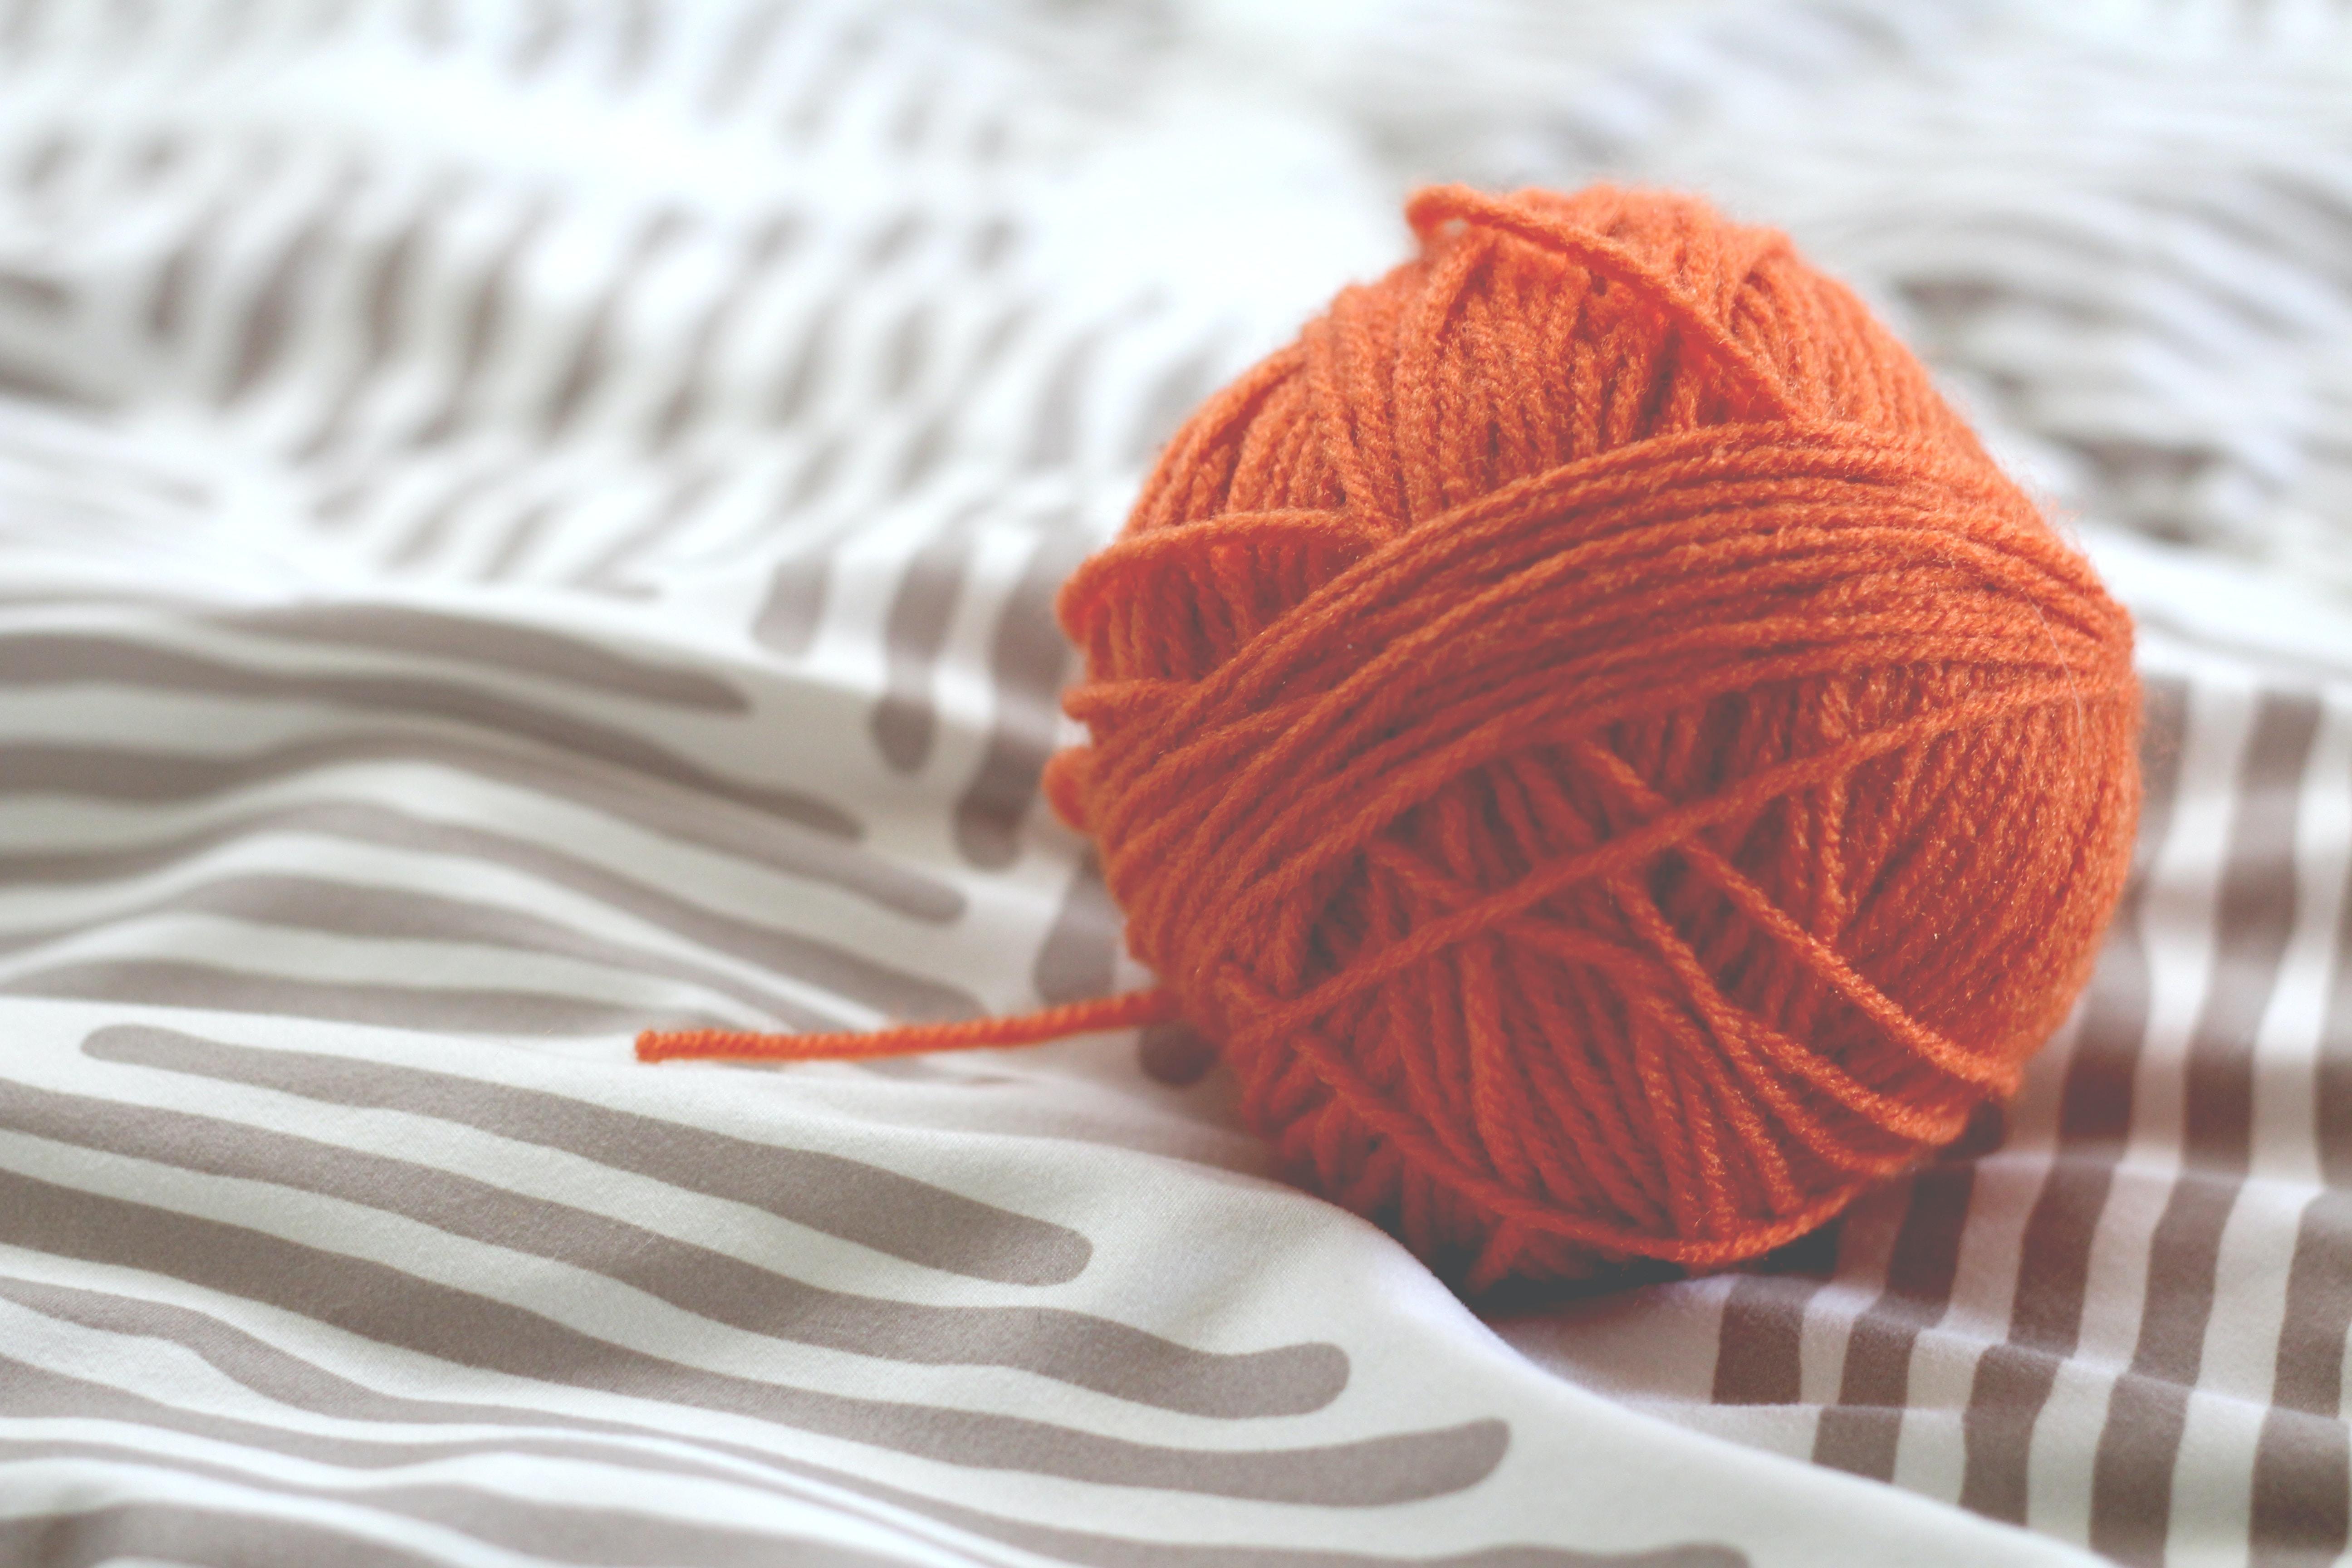 Ball of yarn.... ball of yarn stories